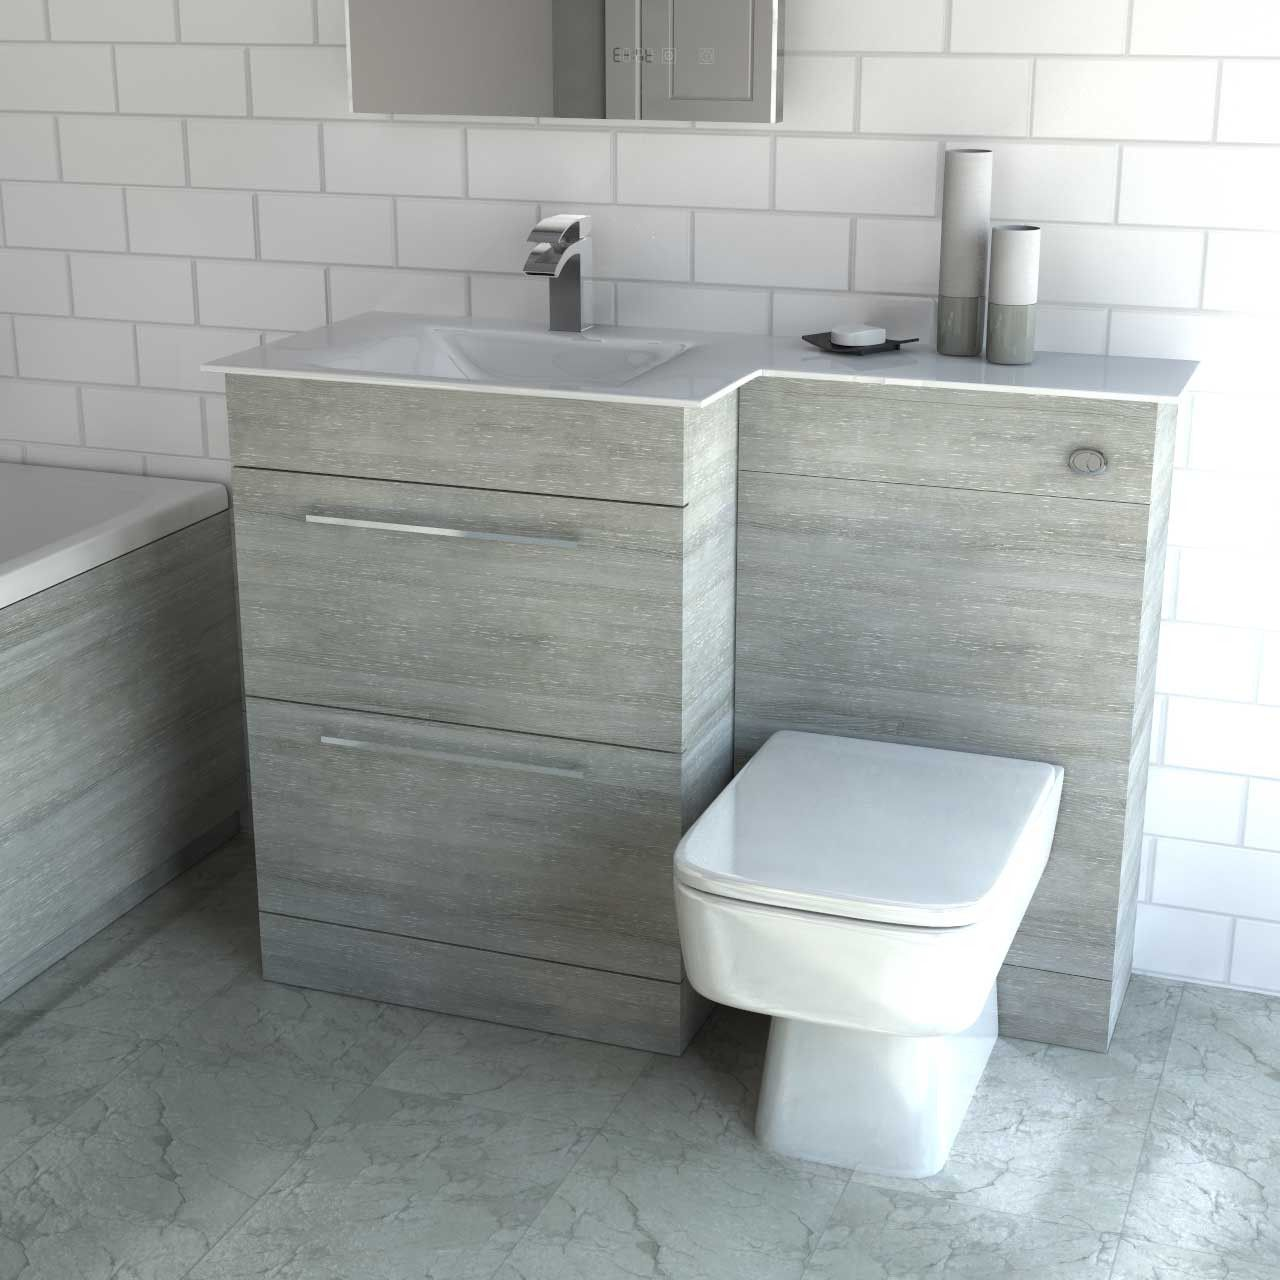 Venice Square Left Hand White Glass 1100mm 2 Drawer Molina Ash Vanity Unit Toilet Suite Minimalist Bathroom Bathroom Interior Toilet Suites